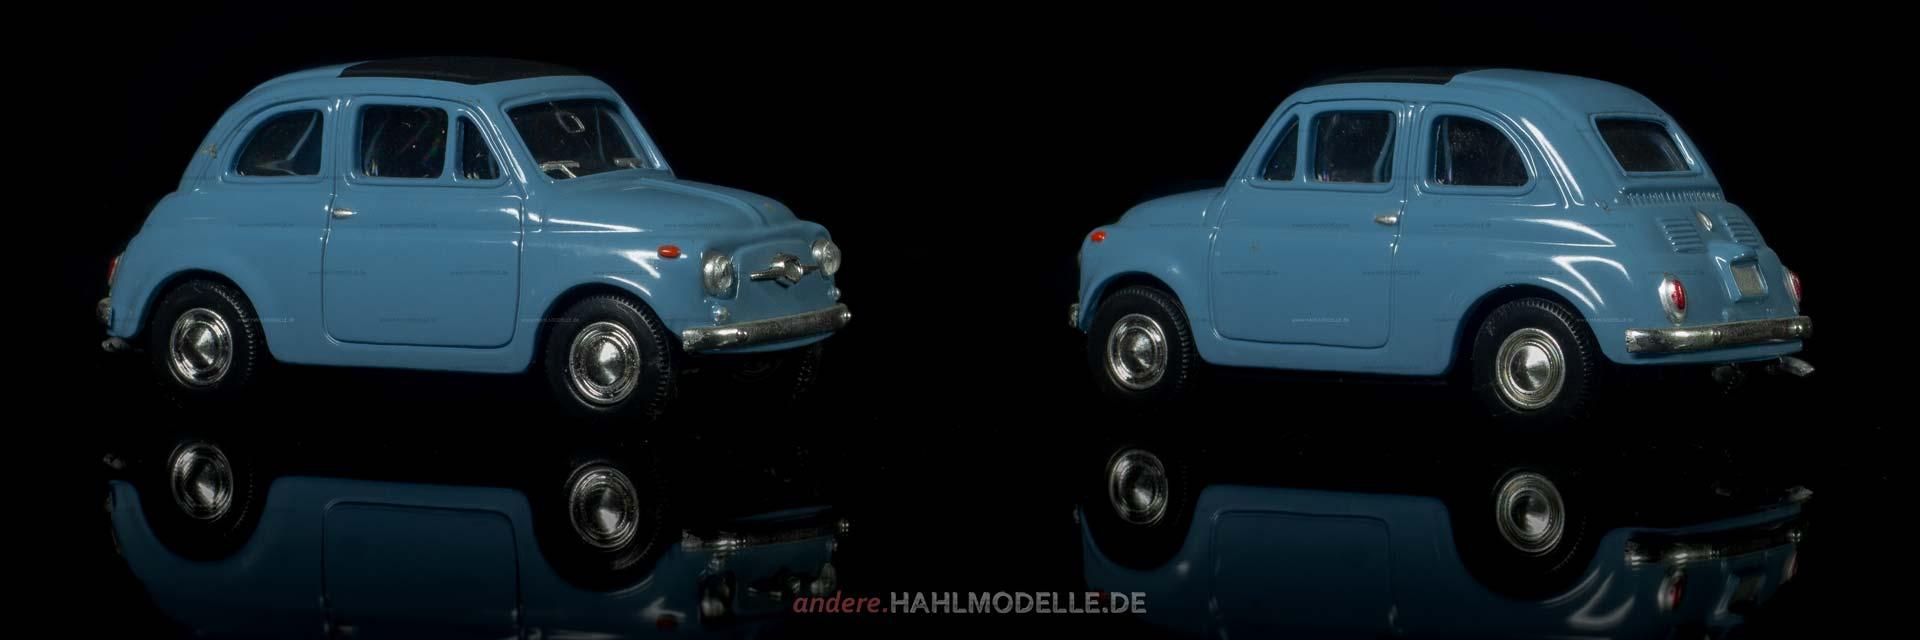 FIAT Nouva 500 | Kleinwagen | Ixo (Del Prado Car Collection) | 1:43 | www.andere.hahlmodelle.de